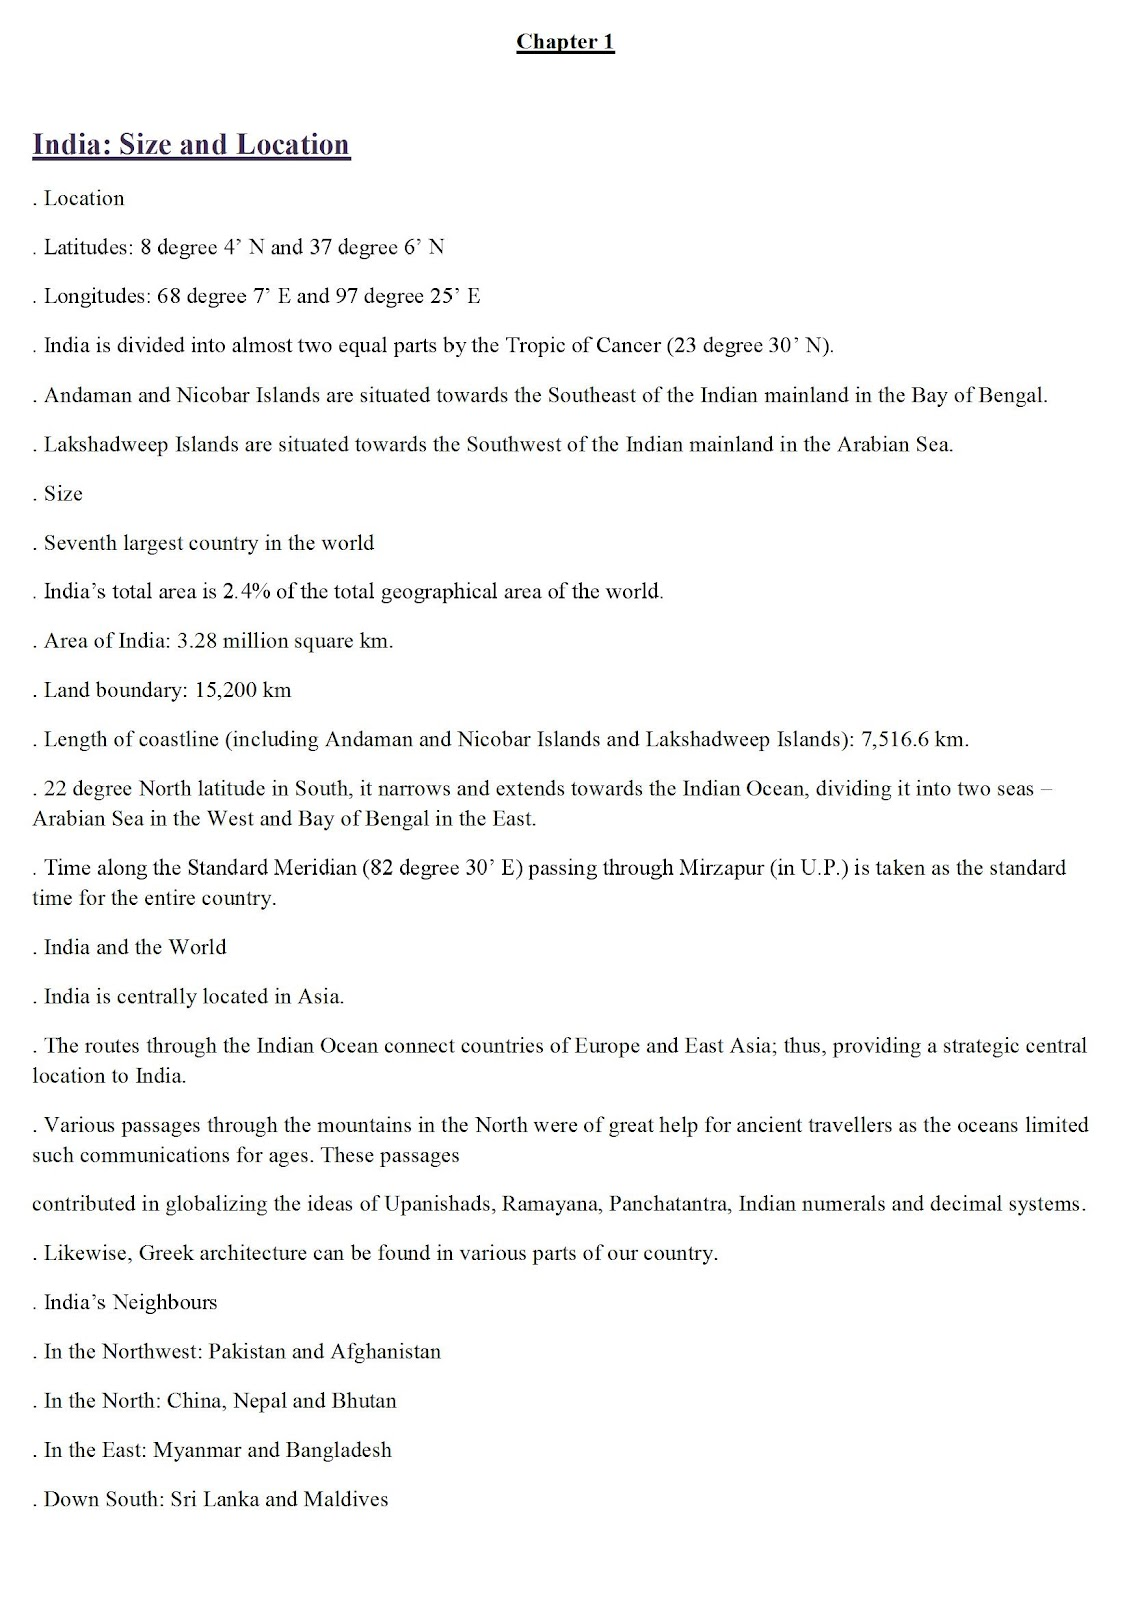 Cbse Class Ix Social Science Revision Notes